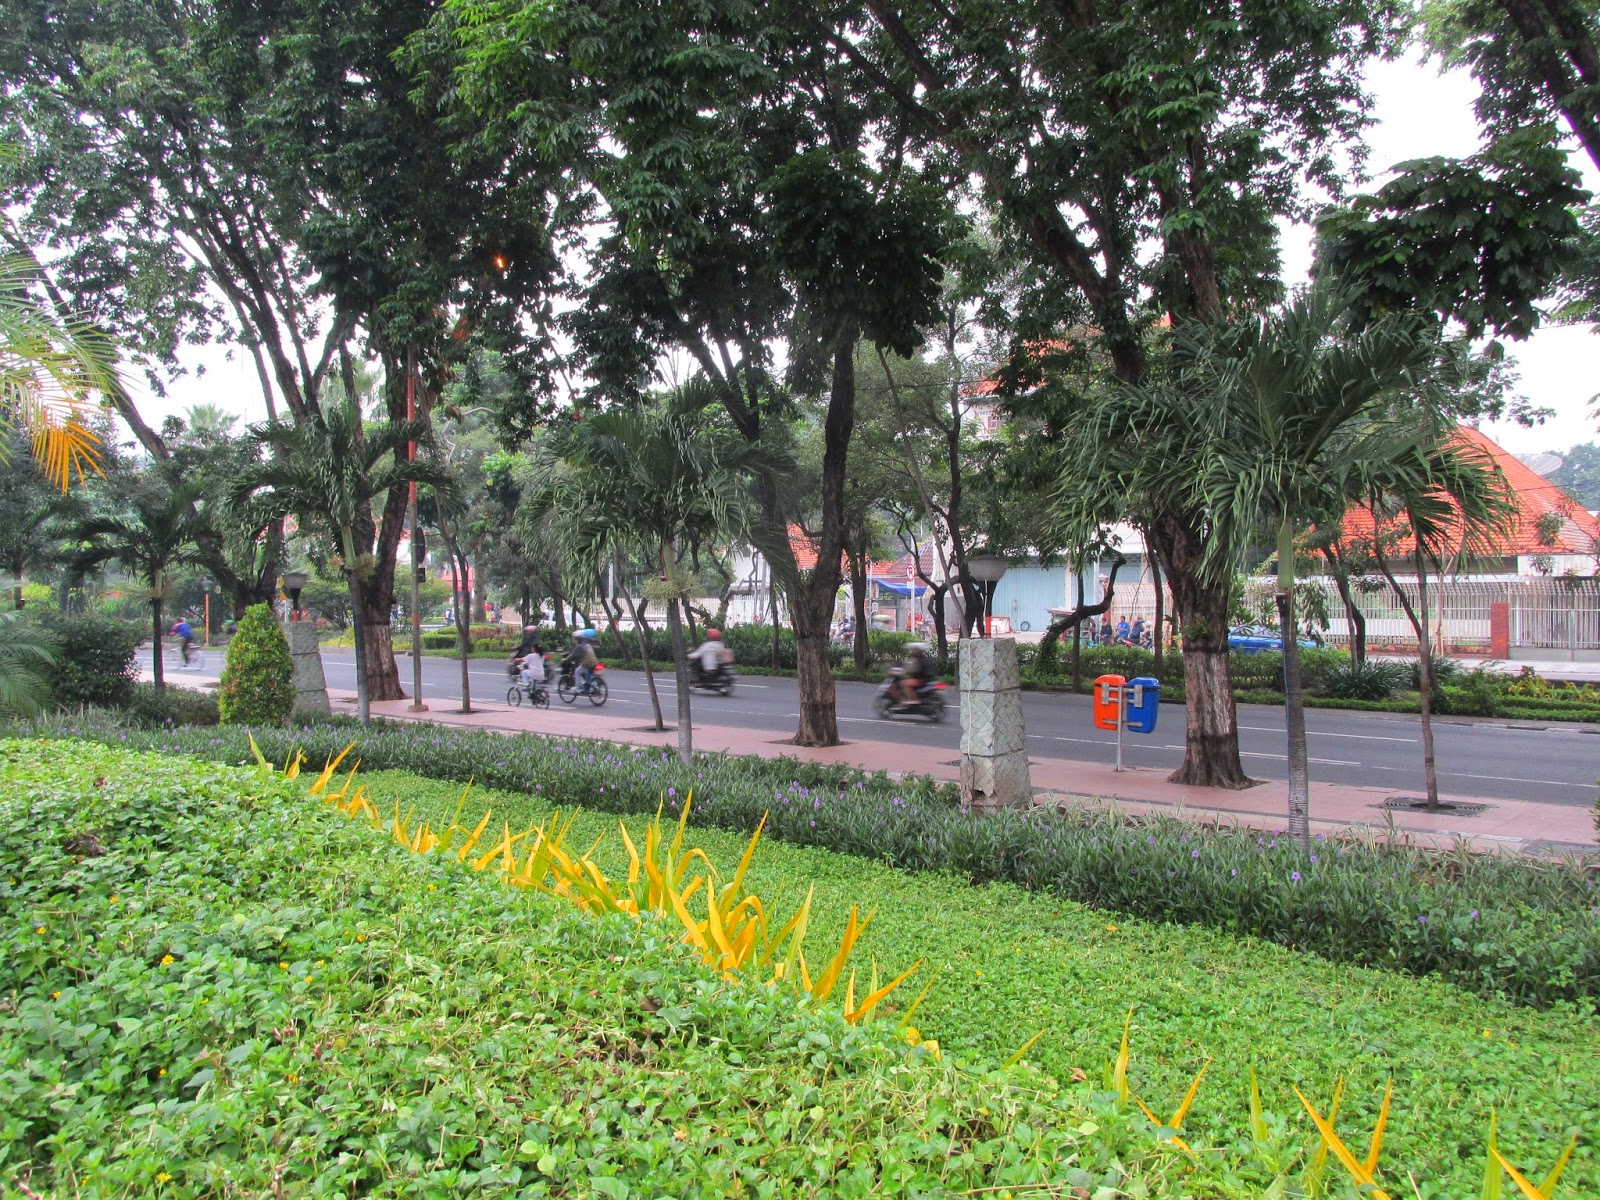 Resolusi Hijau 2015 Menyelamatkan Bumi Taman Mayangkara Surabaya Dokumen Pribadi